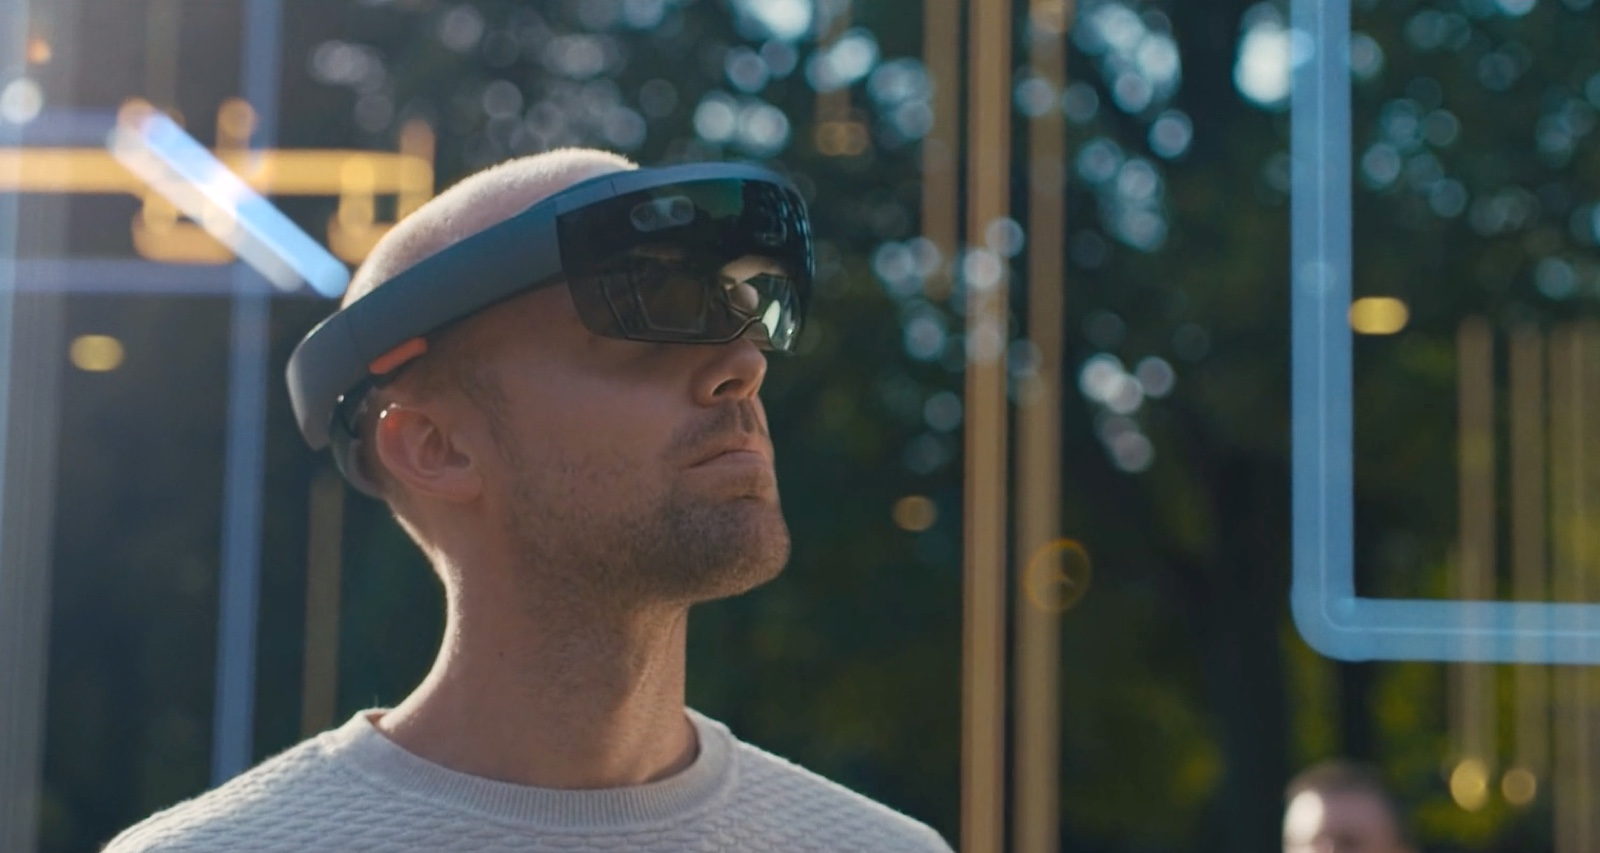 Virtual Reality Bril - BIM Master visualiseert het model van een bouwwerk